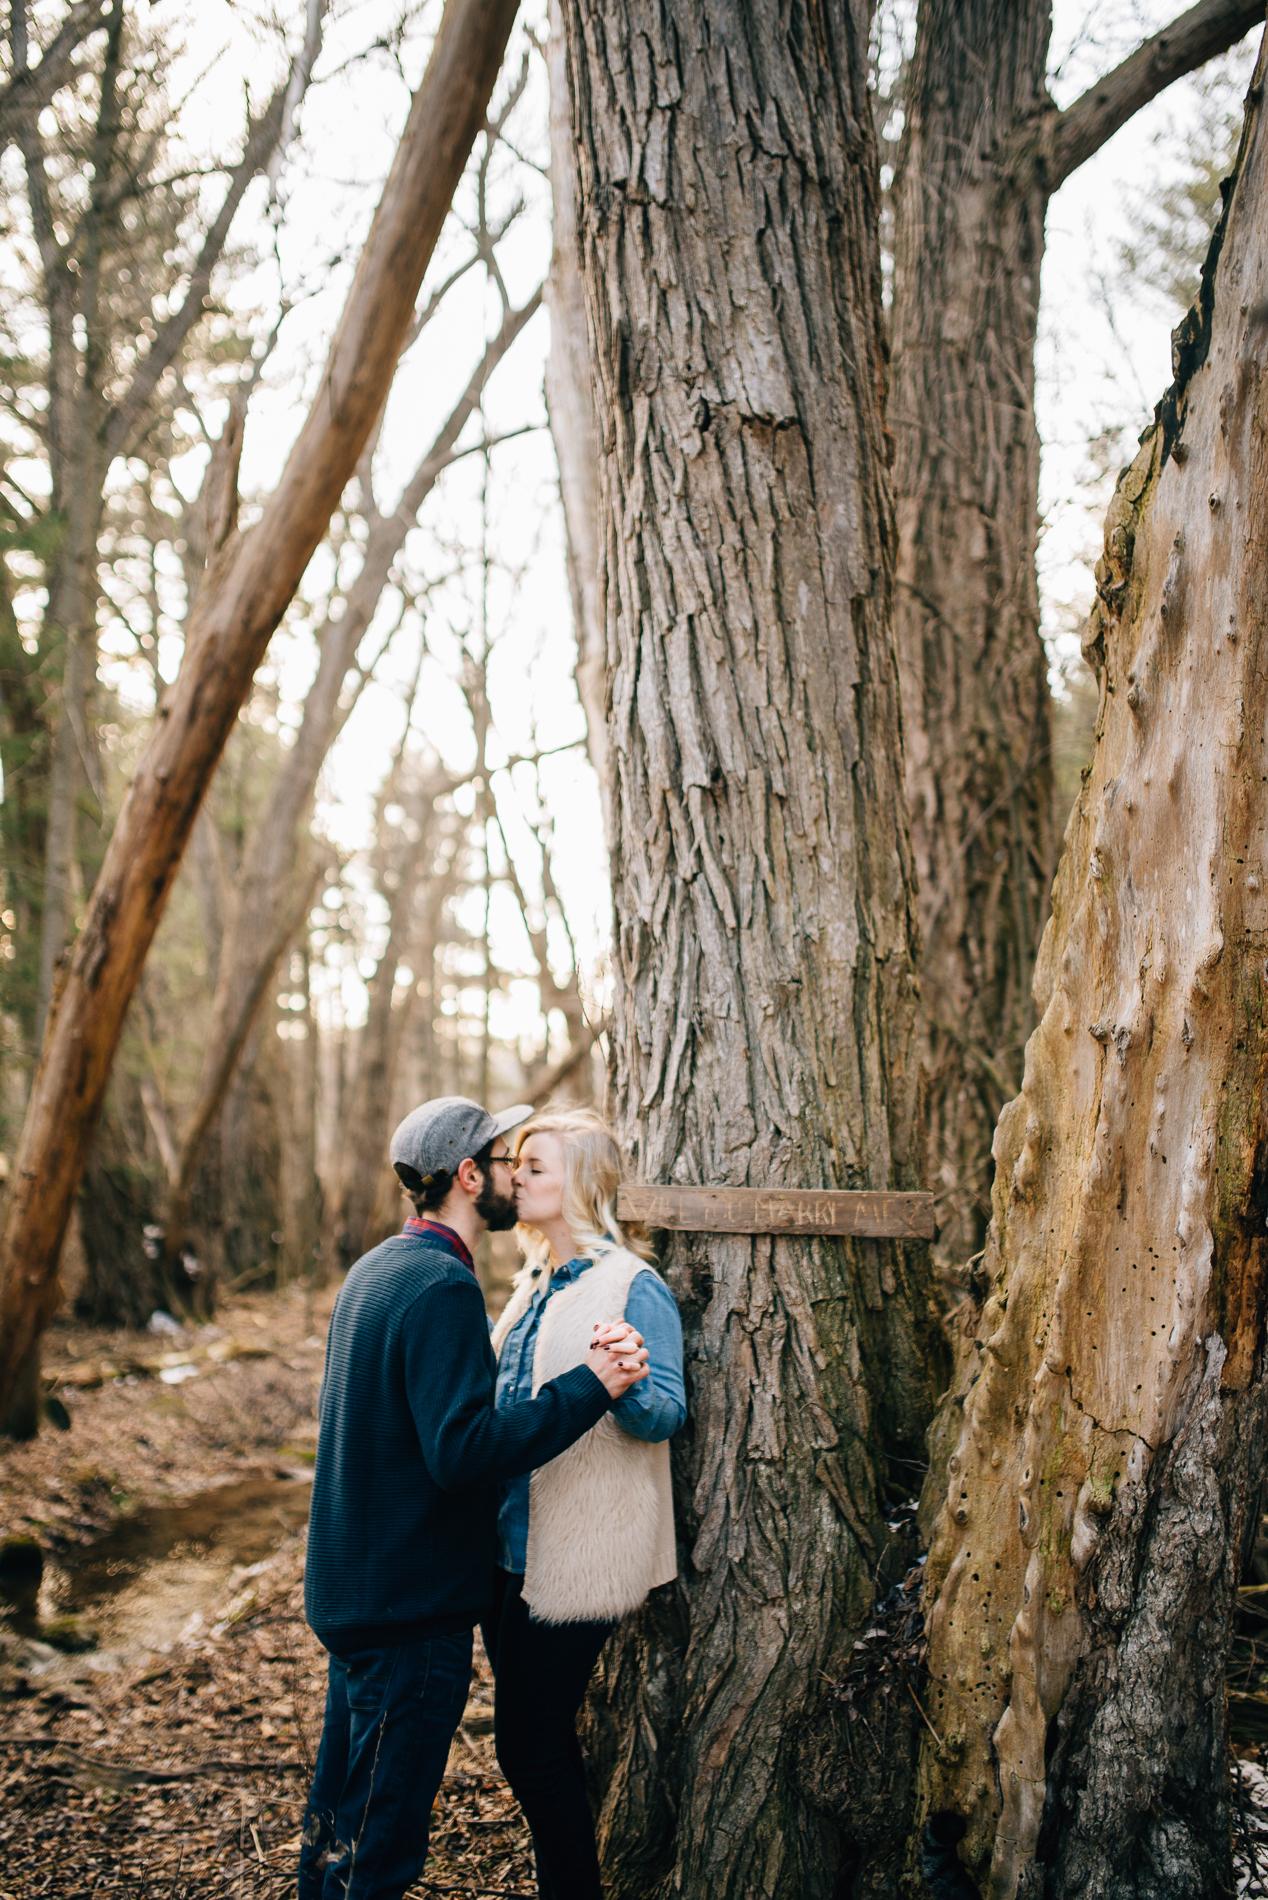 Winter-Forest-Engagement-Shoot-19